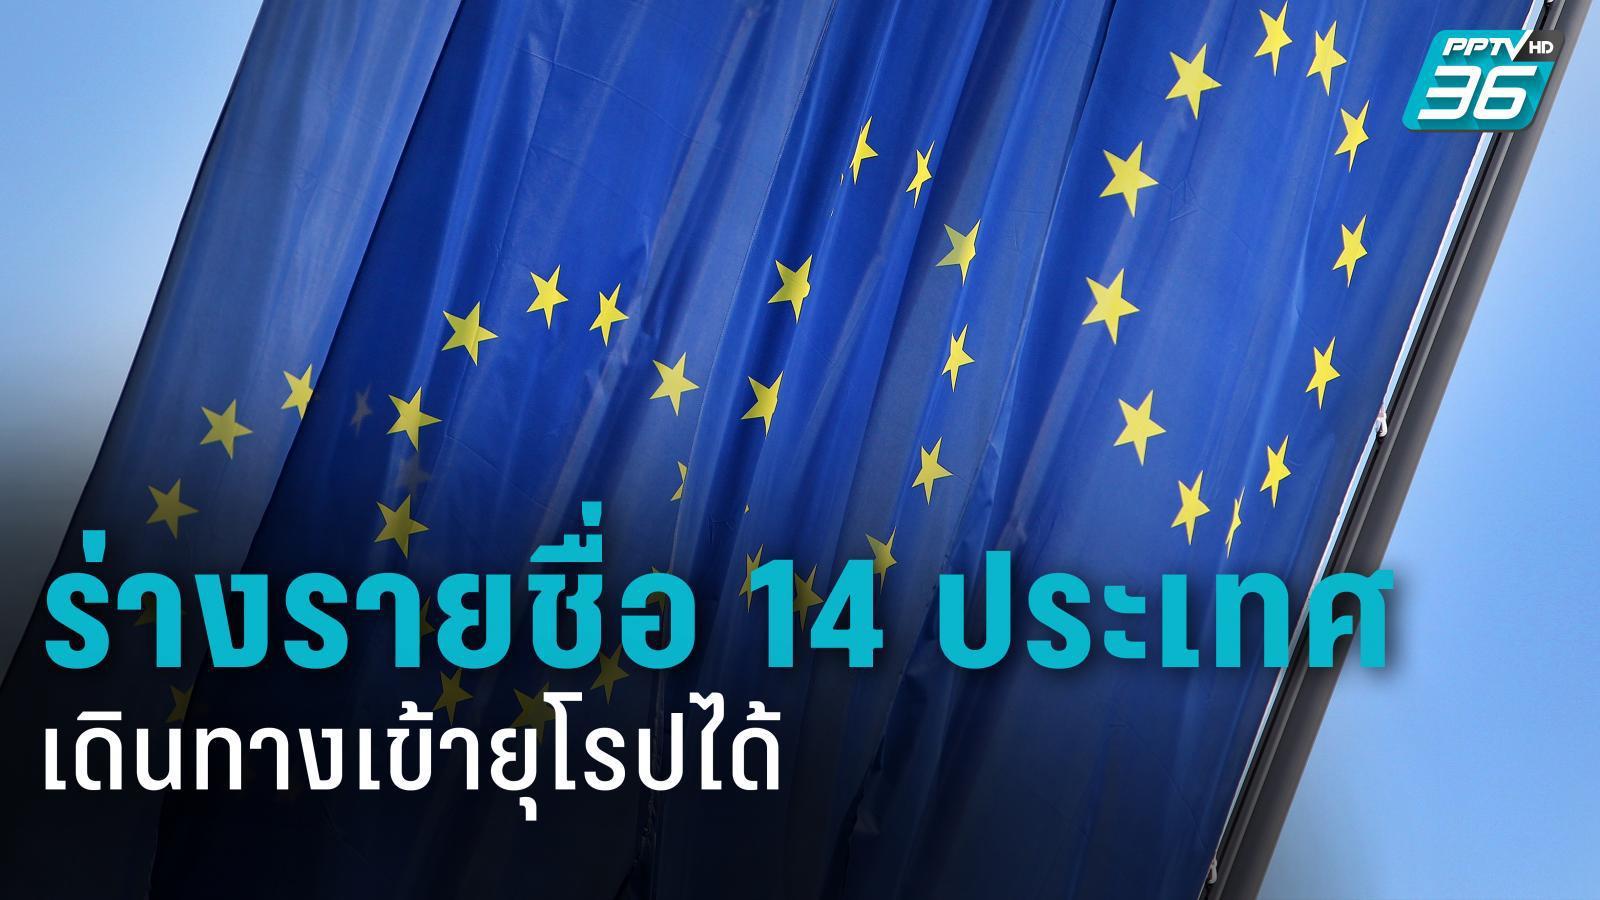 EU ร่างรายชื่อ 14 ประเทศที่สามารถกลับไปเที่ยวยุโรปได้